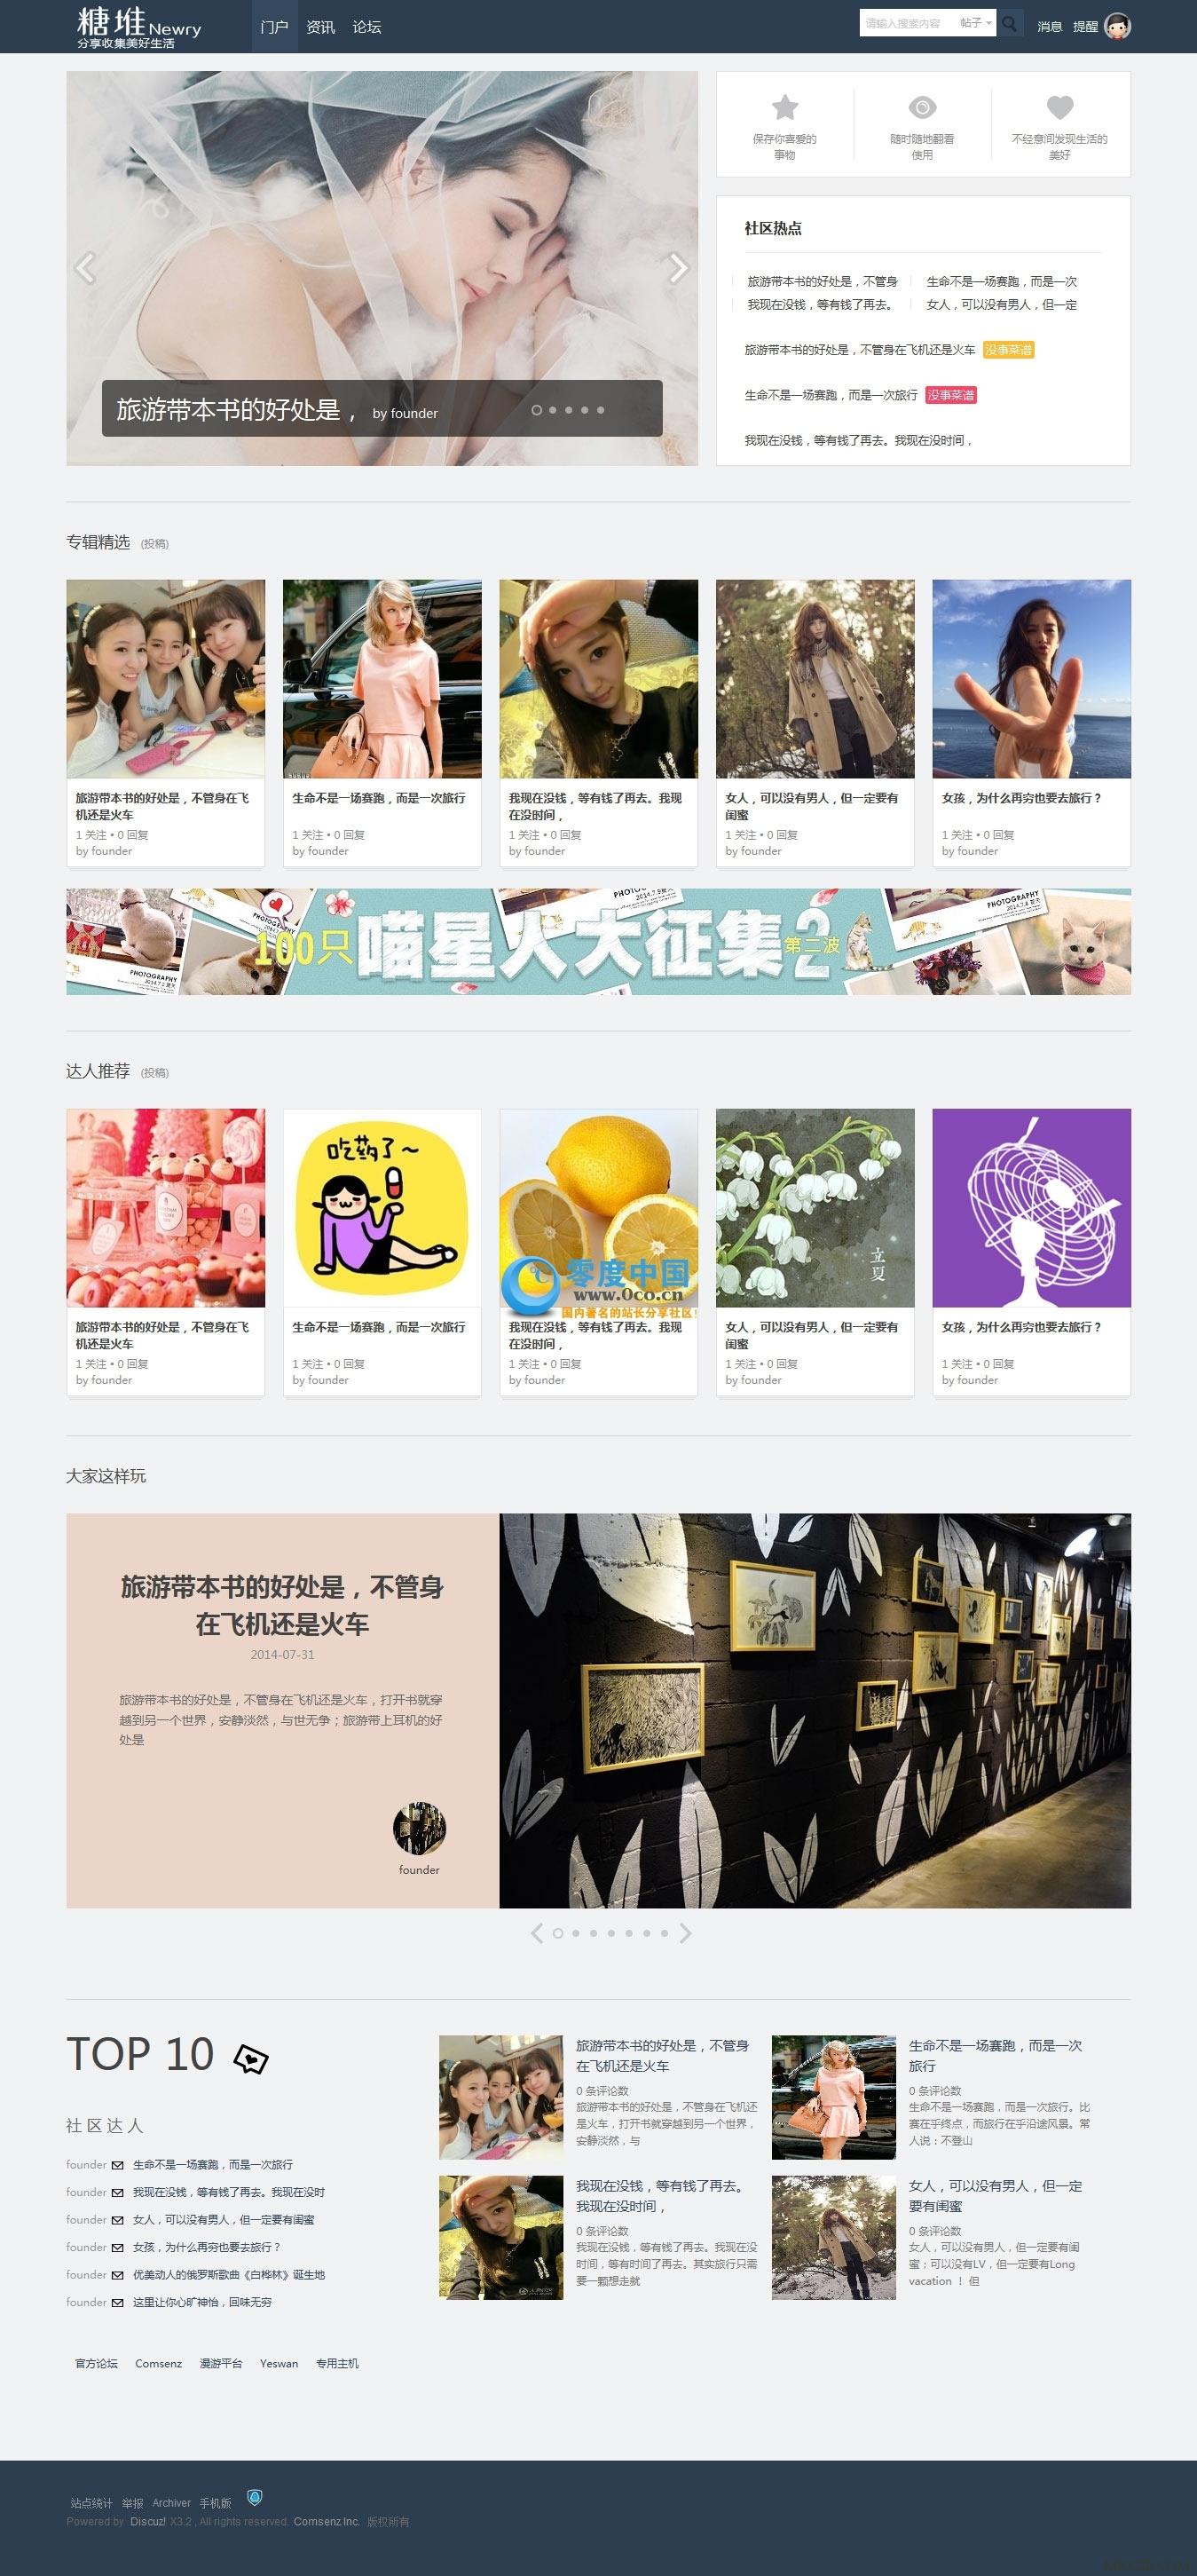 [Discuz模板]糖堆宽屏分享社区网站模板 分享类网站源码GBK编码